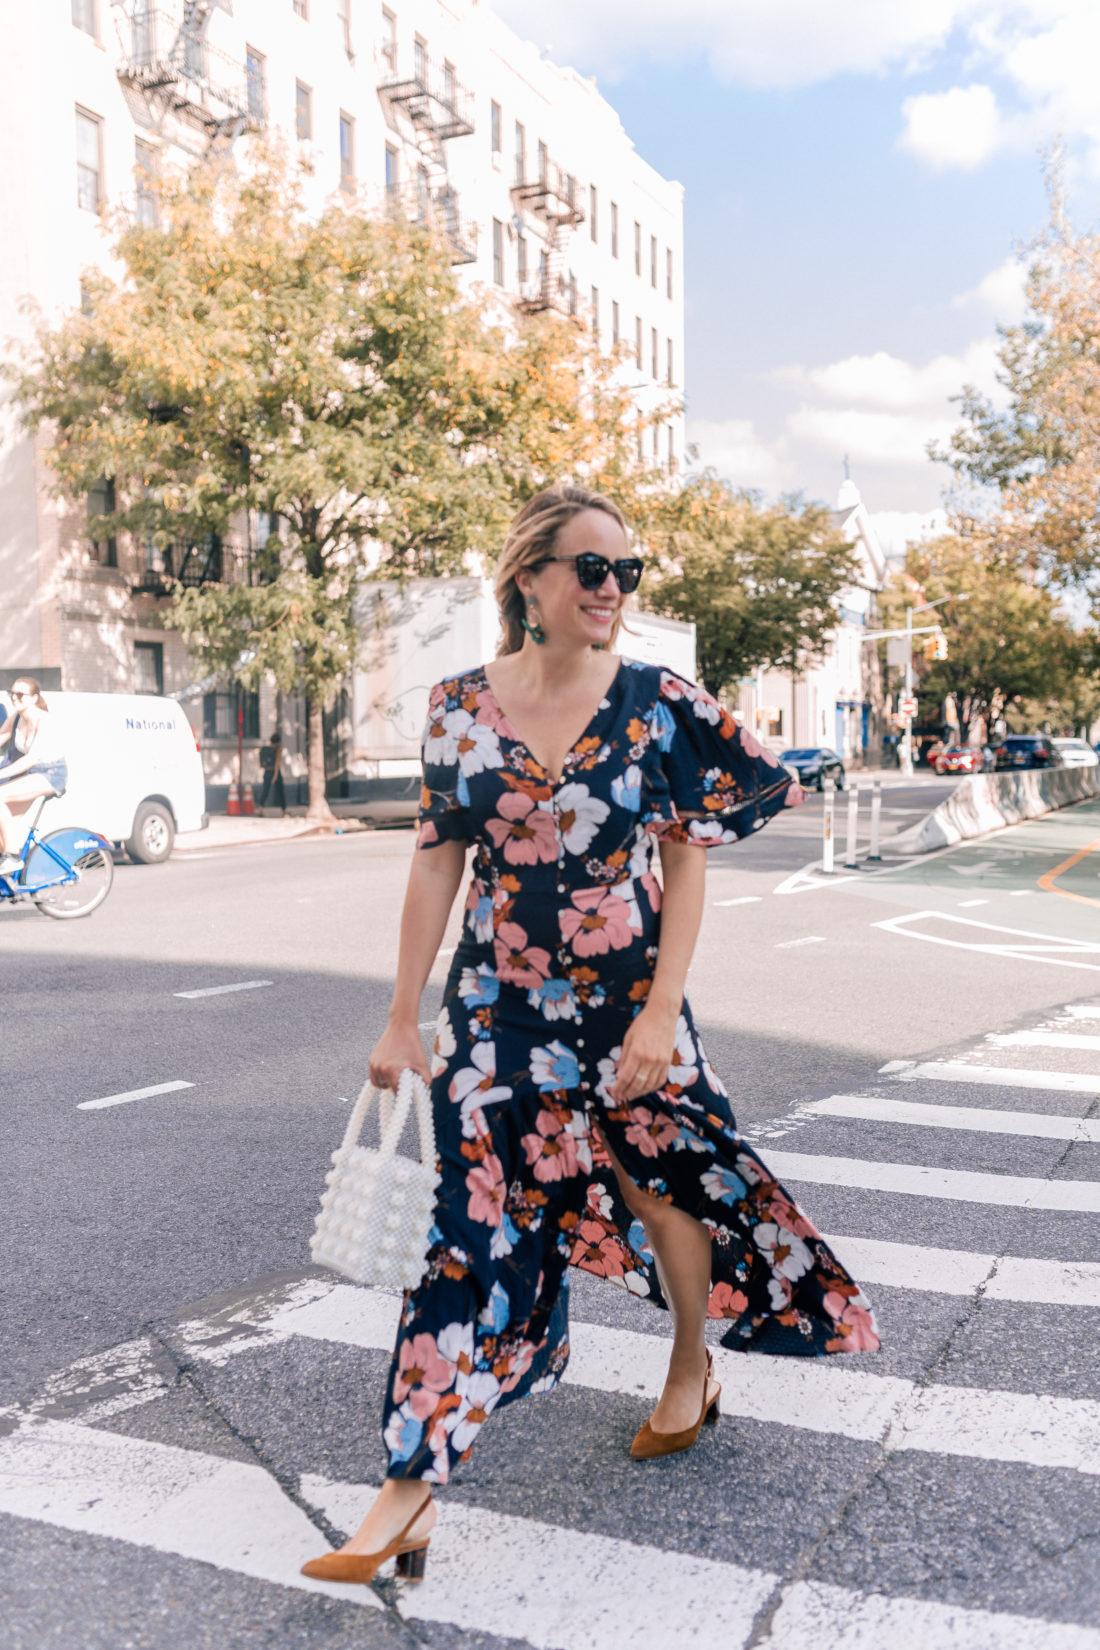 Outfit Details:Ella Moon Dress // Miuco Pearl Bag (obsessed) // Lele Sadoughi Earrings // Sarah Flint Heels// Karen Walker Sunglasses